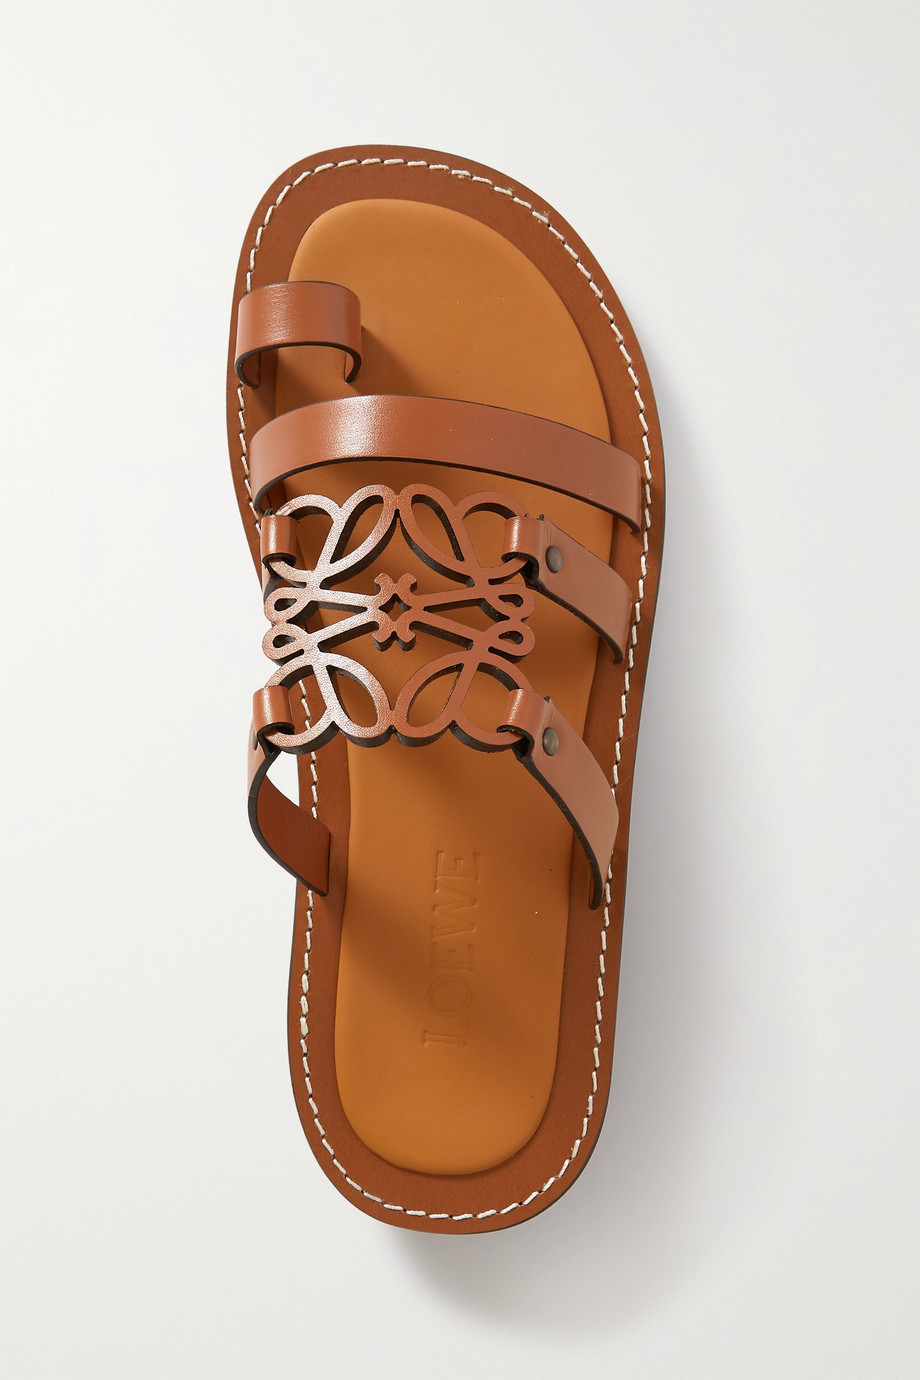 Loewe Anagram leather sandals